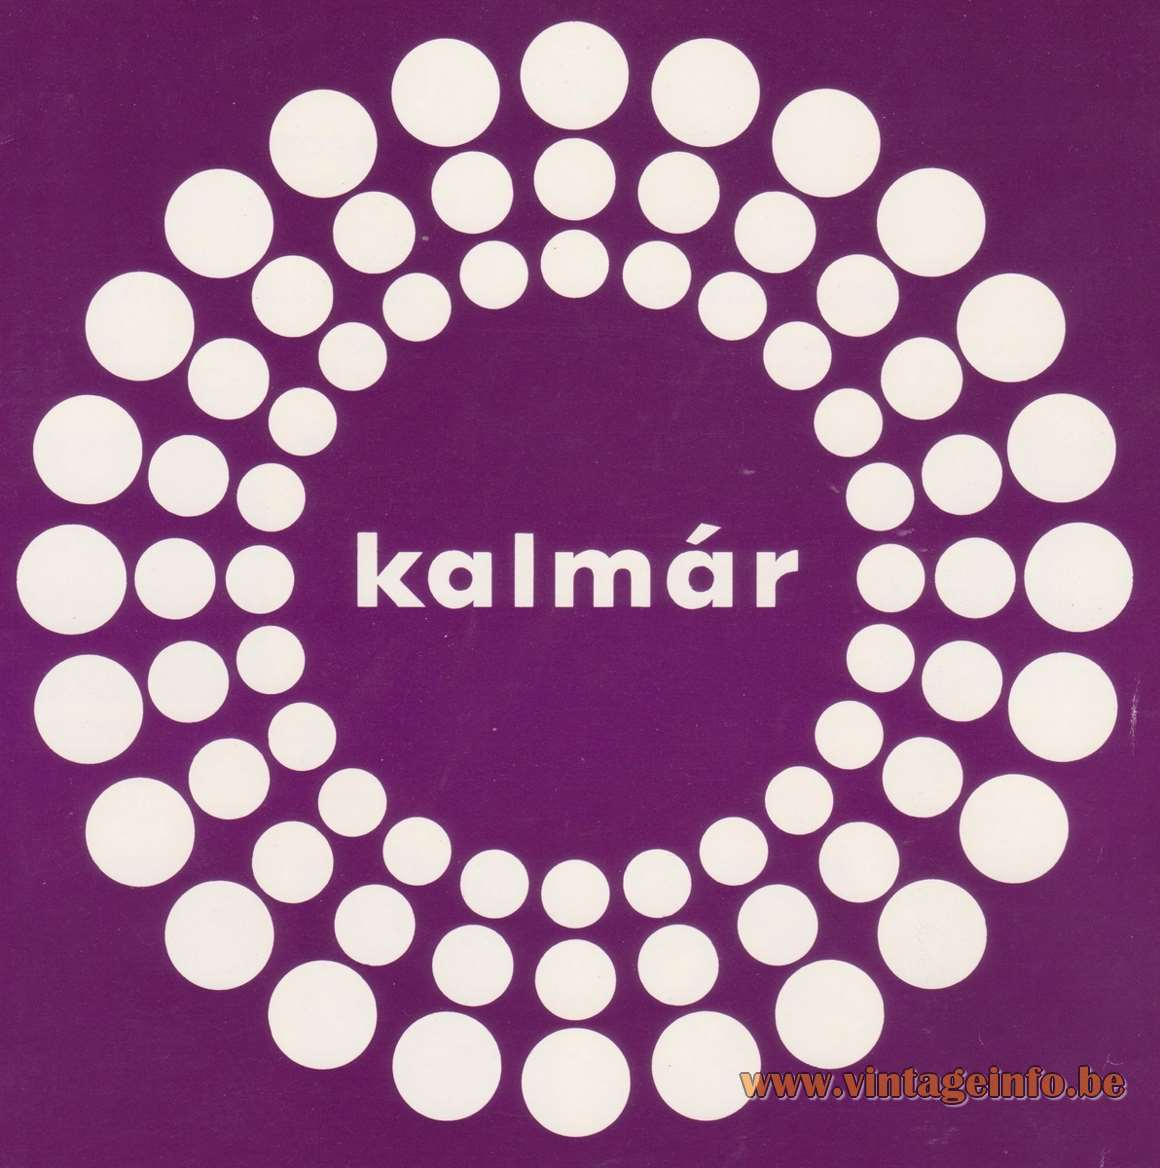 Kalmar Franken 1960s 1970s Logo